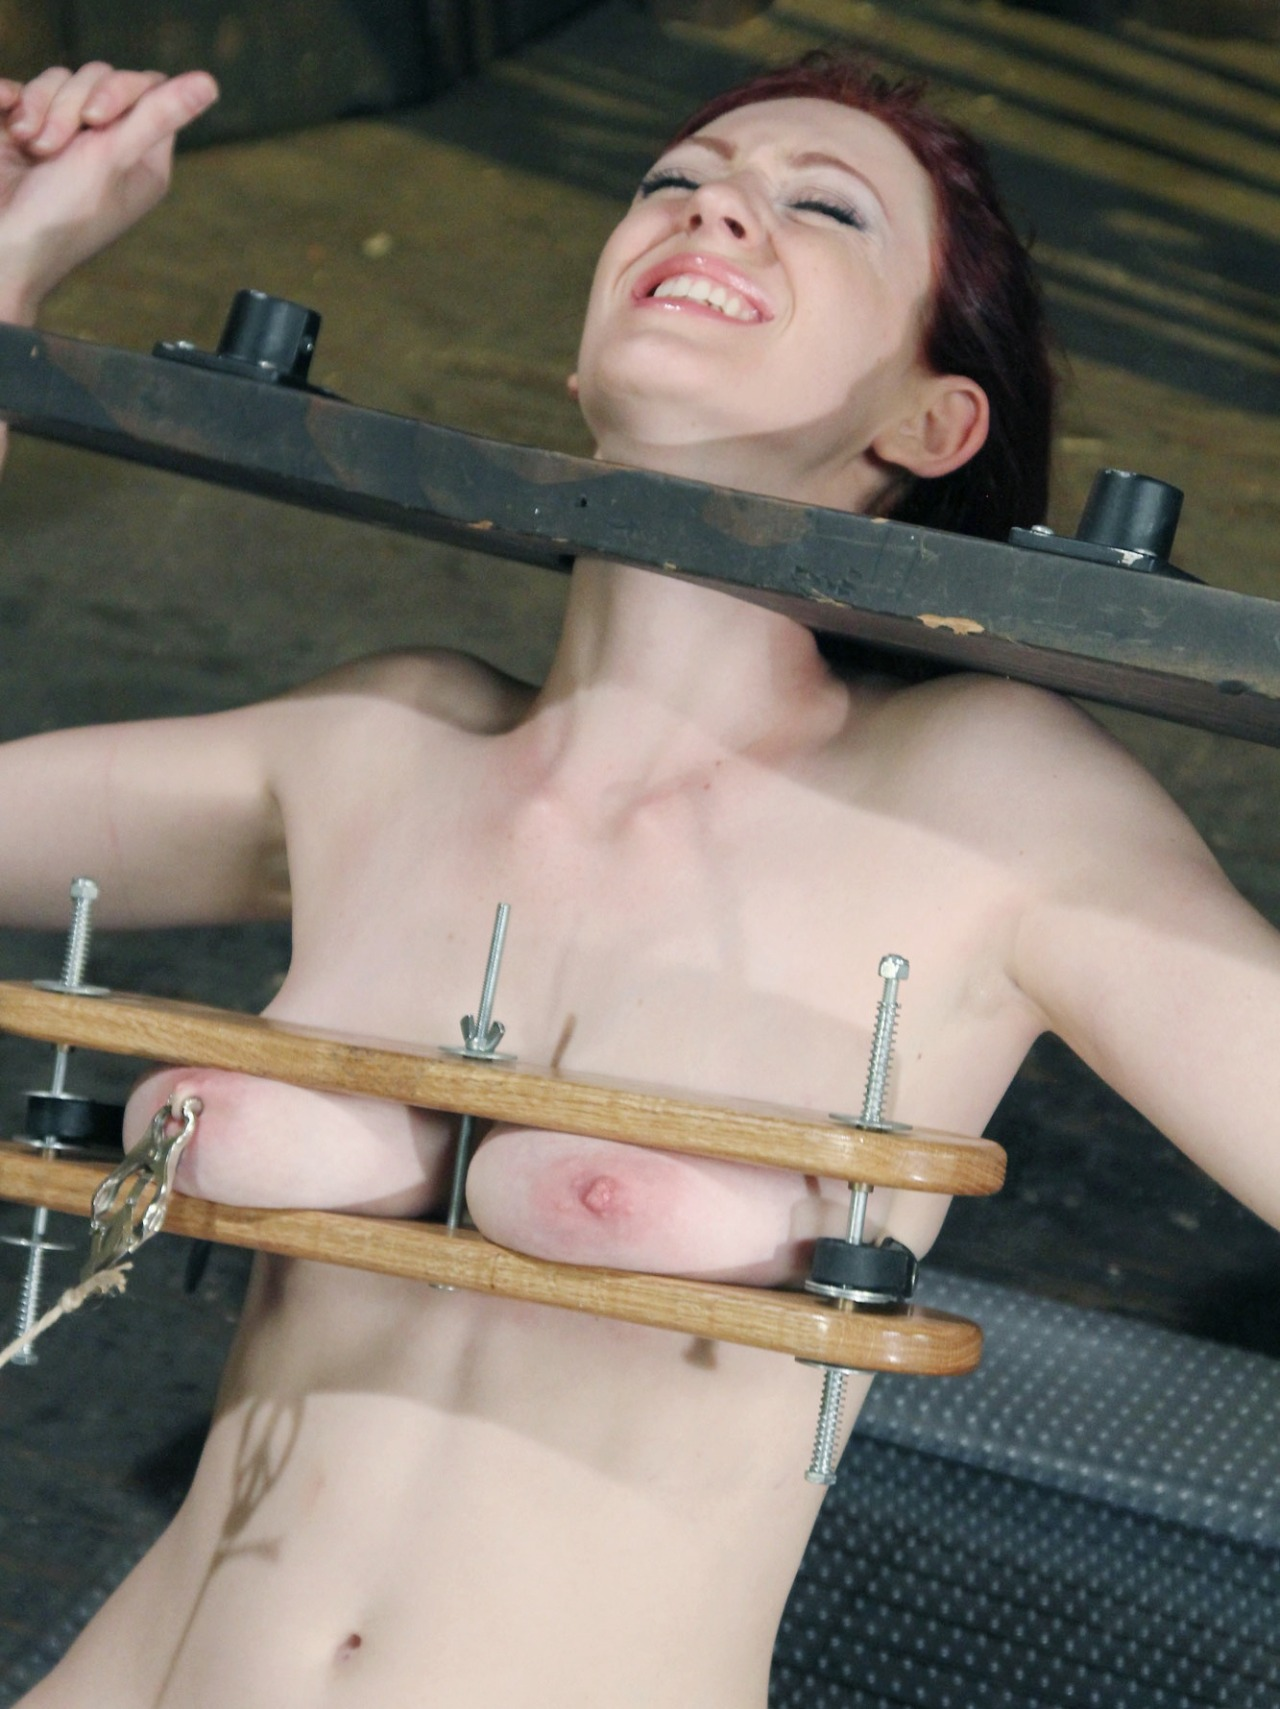 Tit torture tumblr